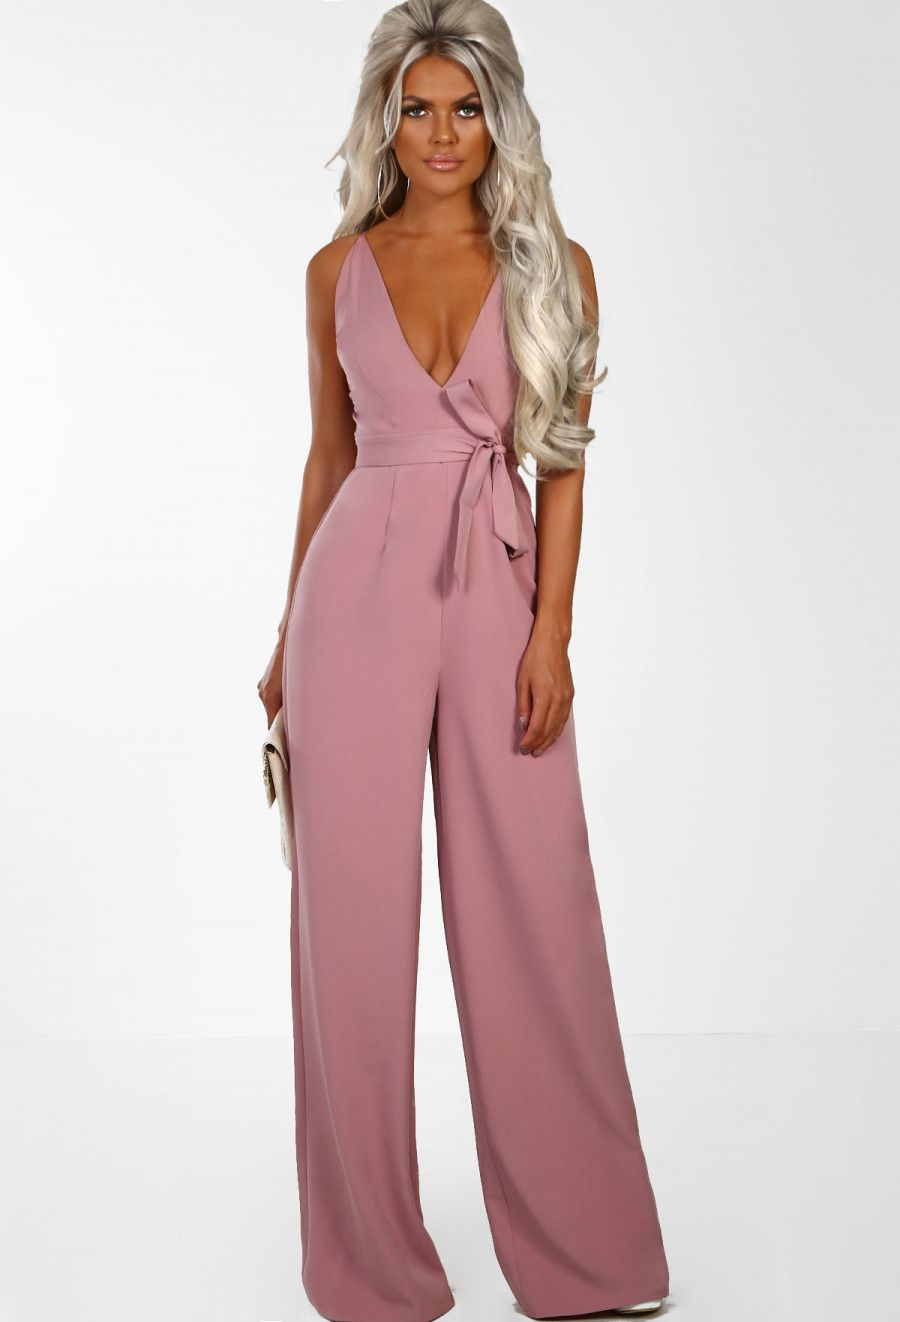 aa291da0351 Visions Of Love Blush Pink Plunge Wide Leg Jumpsuit - 6